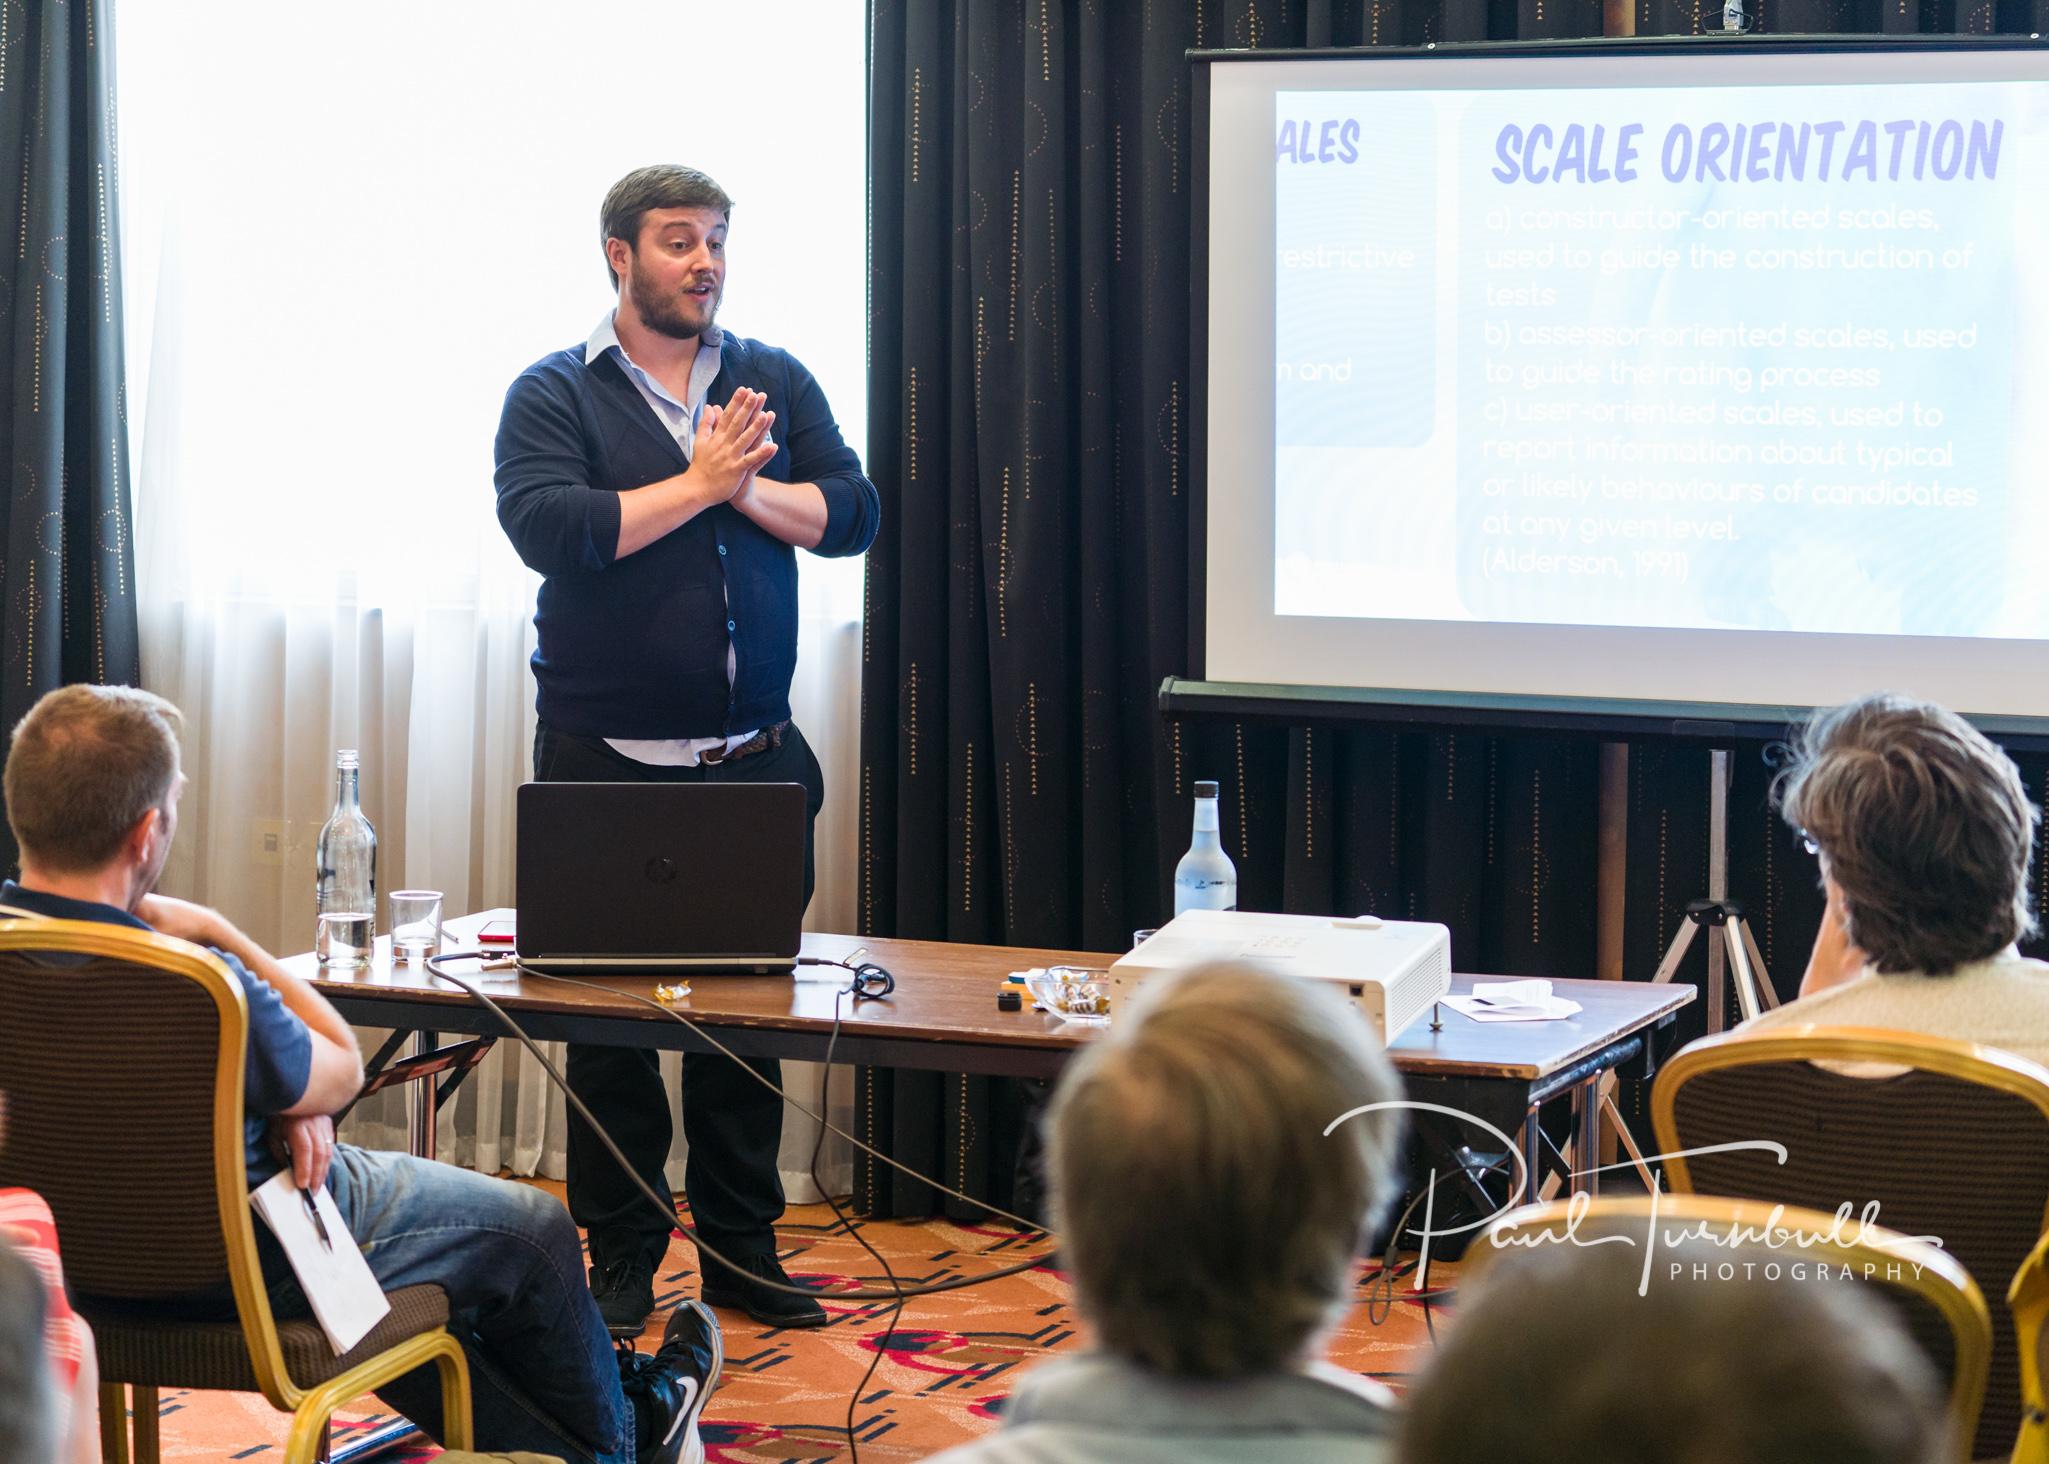 conference-event-photographer-queens-hotel-leeds-yorkshire-055.jpg